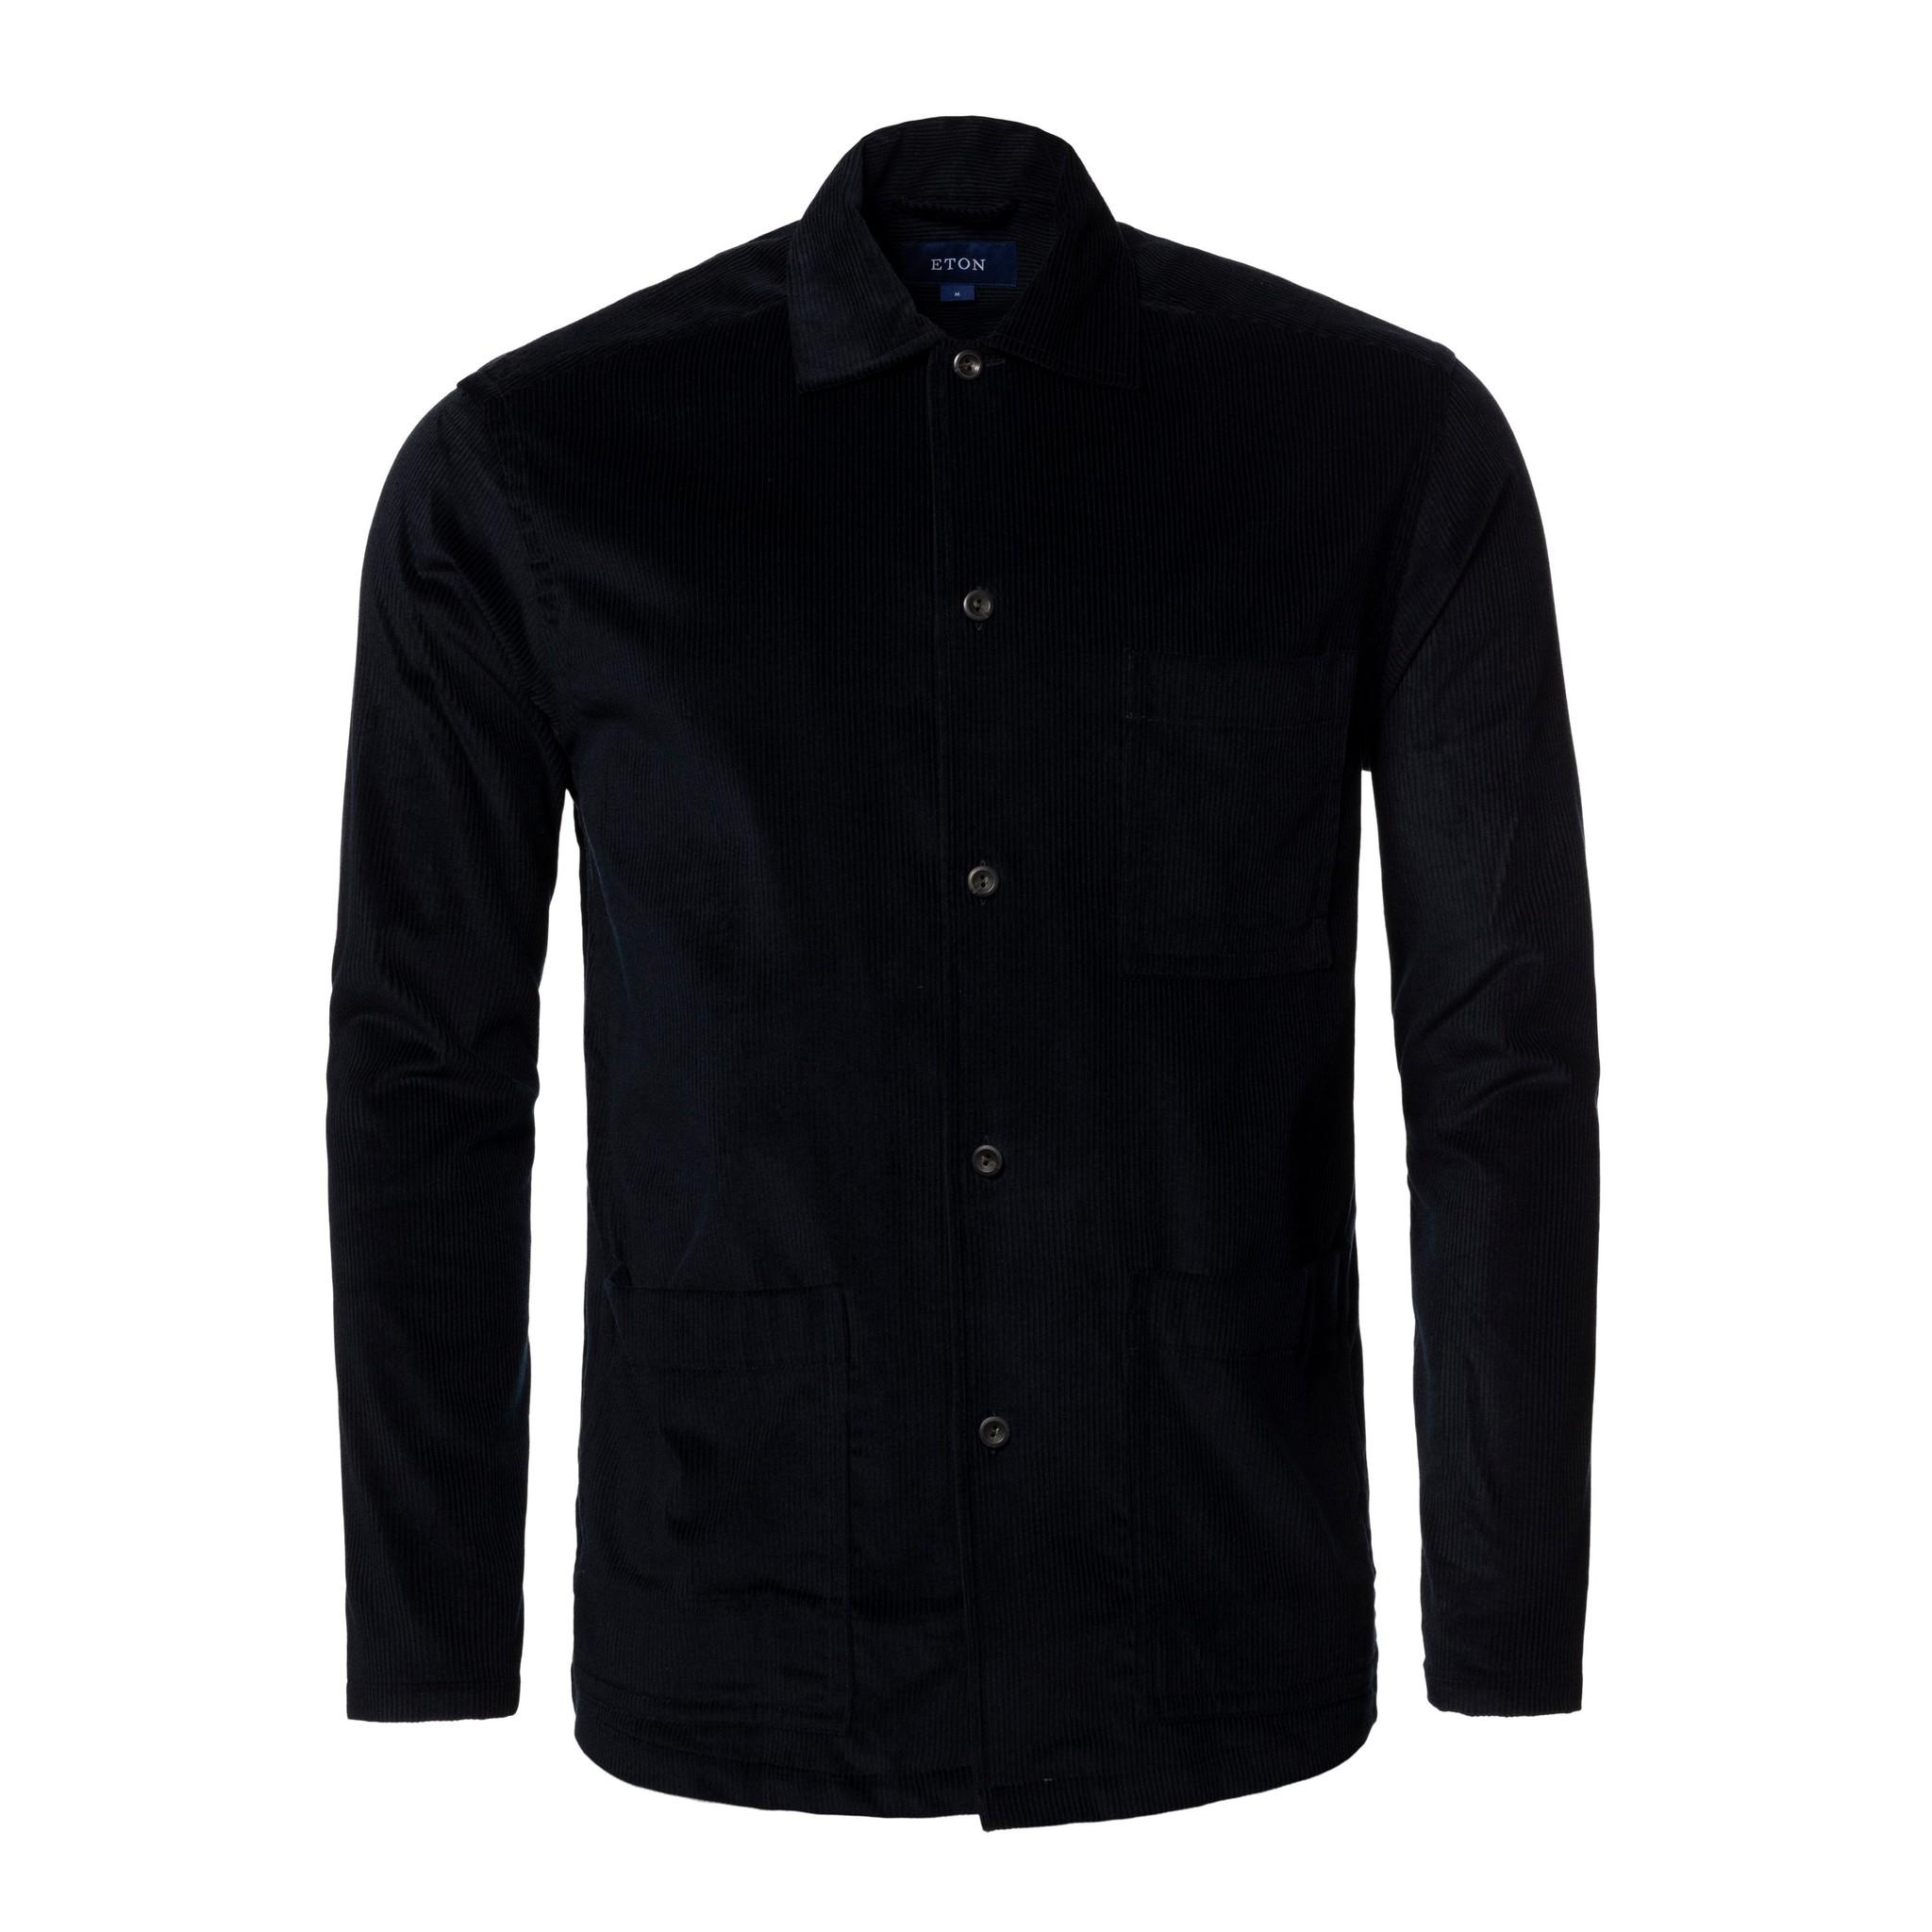 Eton Dark Blue Corduroy Overshirt